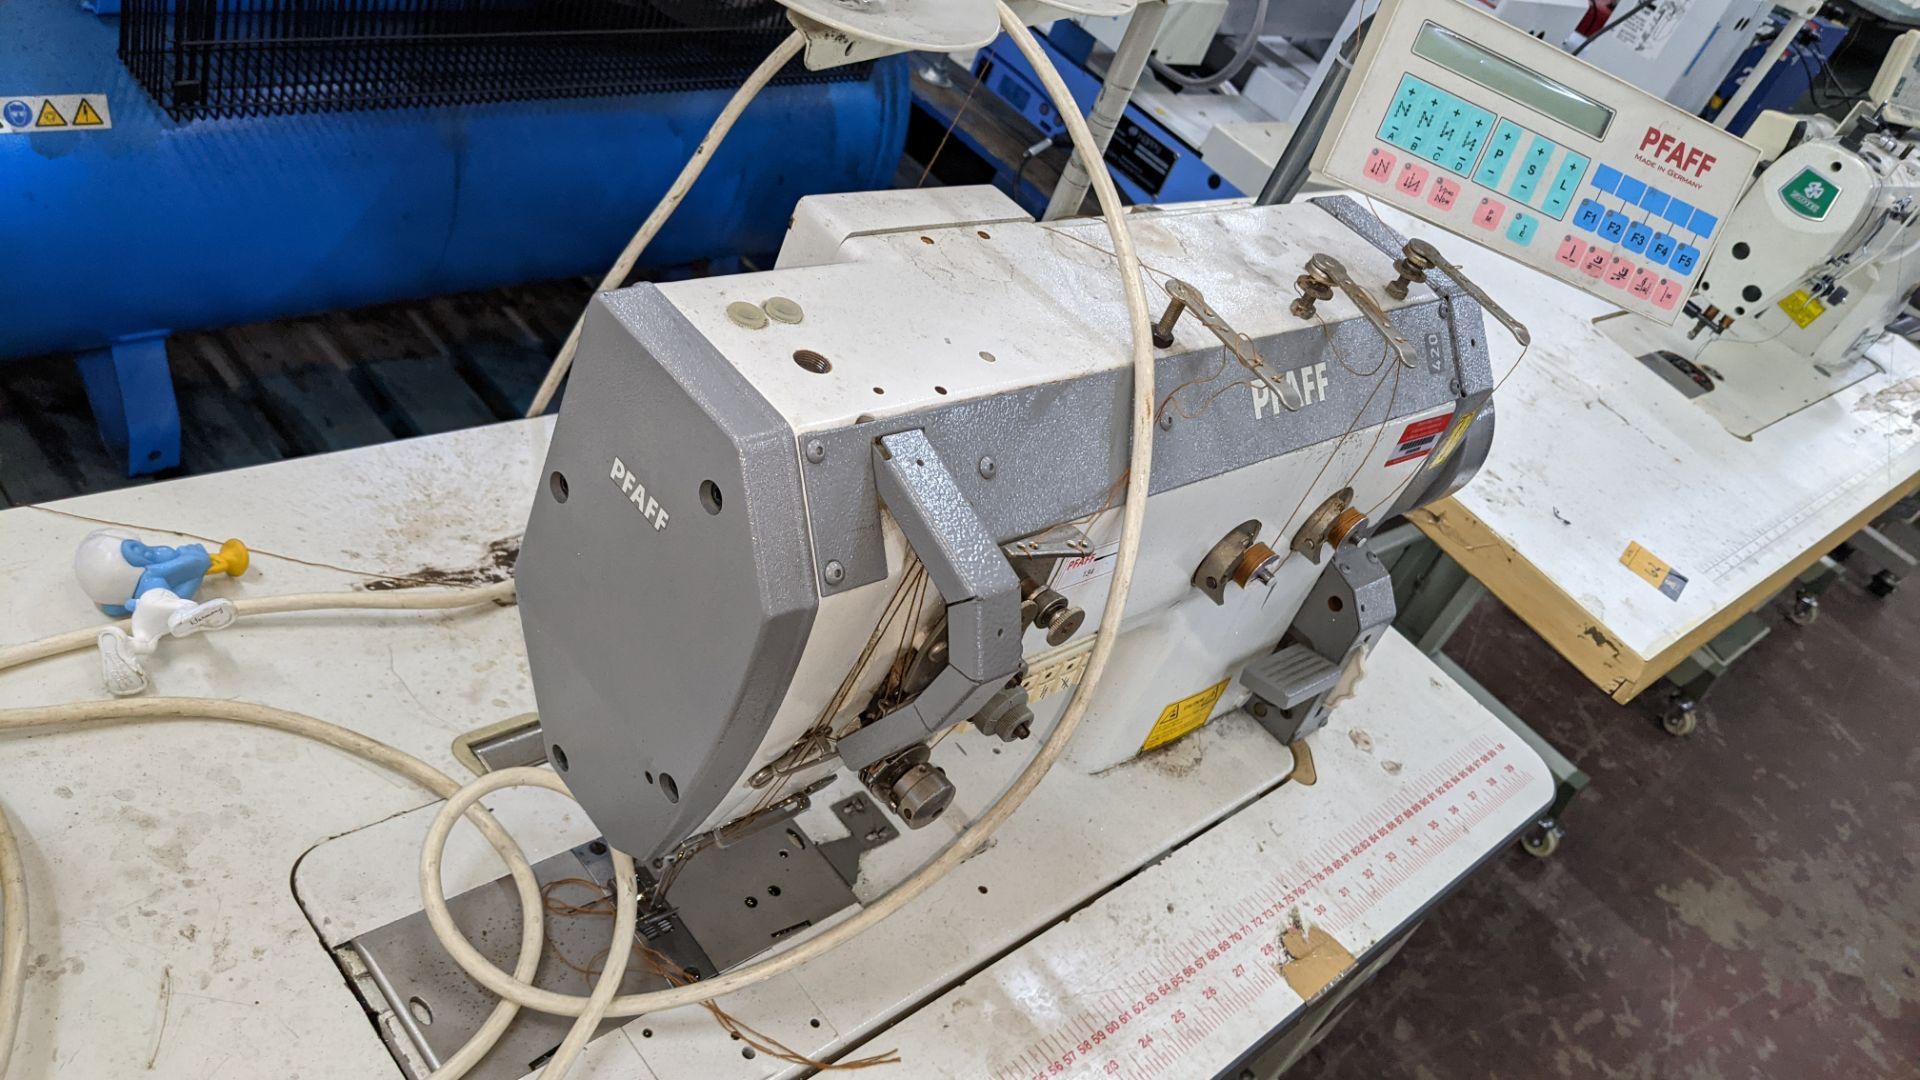 Pfaff twin needle sewing machine, model 422 - Image 13 of 17